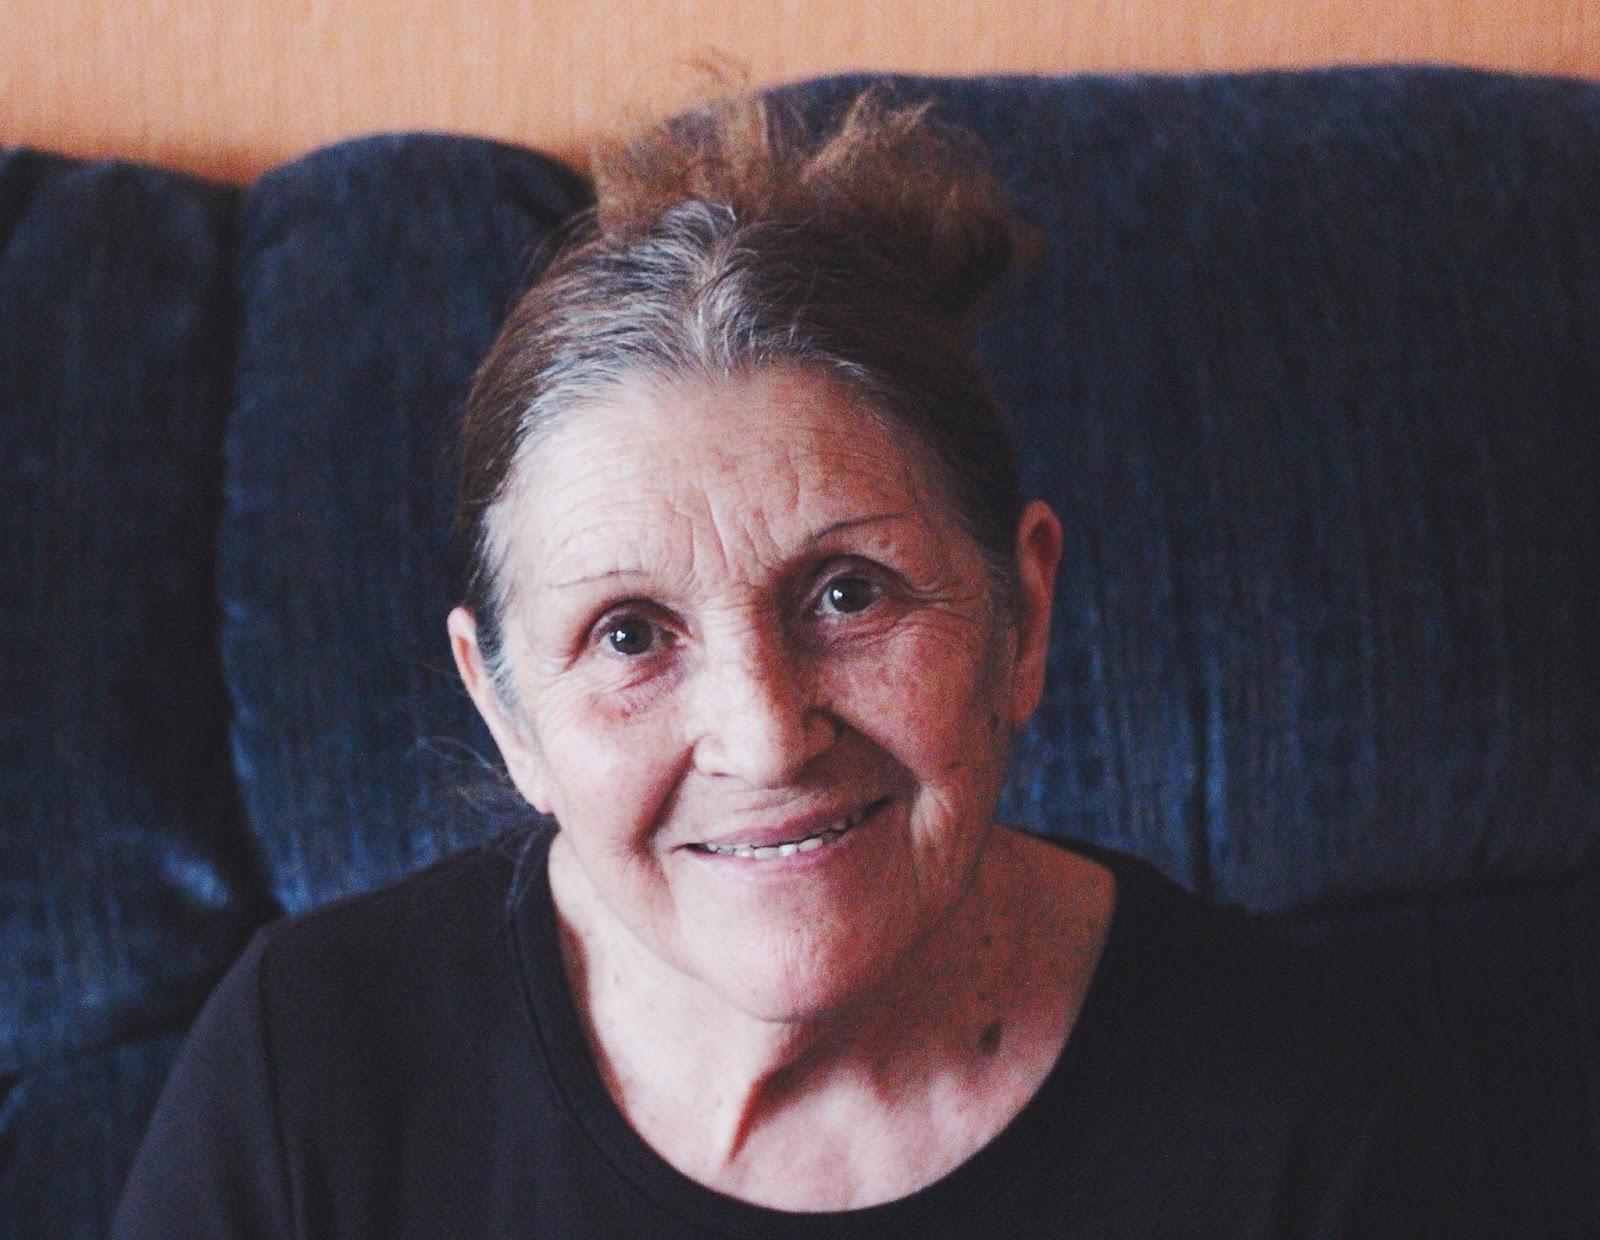 The listening ear project - Nilda, 72